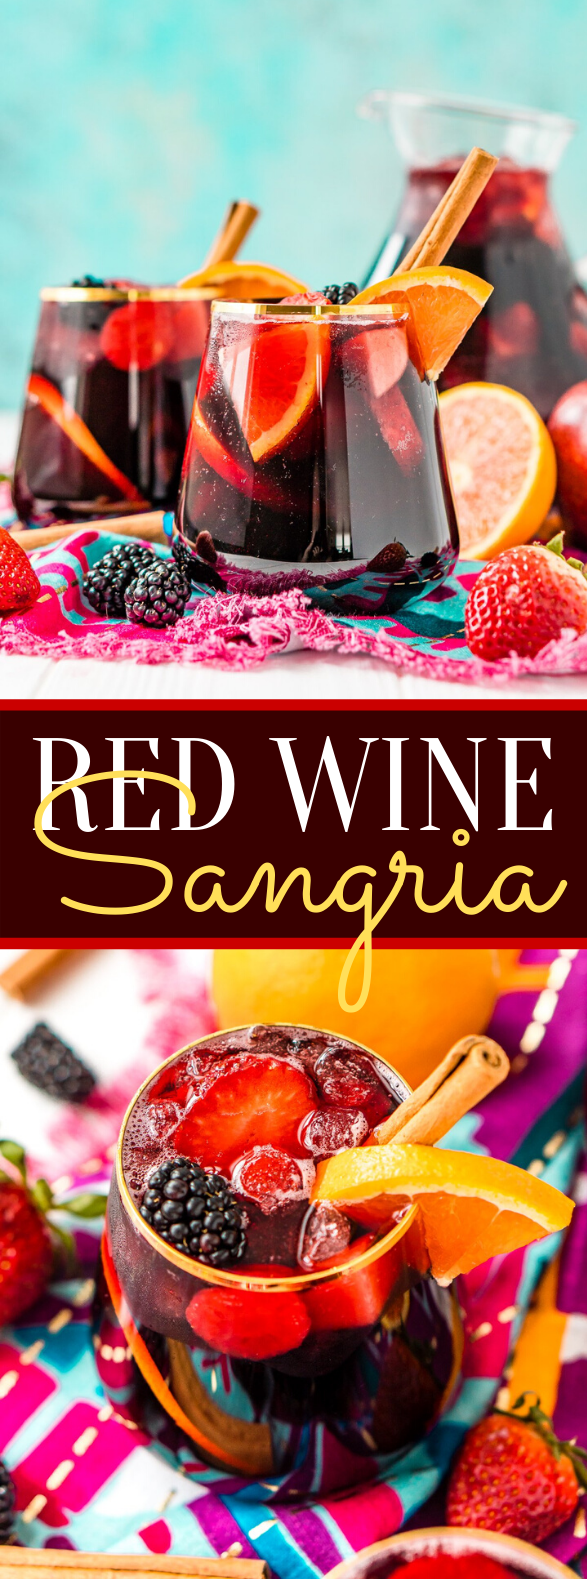 Red Wine Sangria #cocktails #drinks